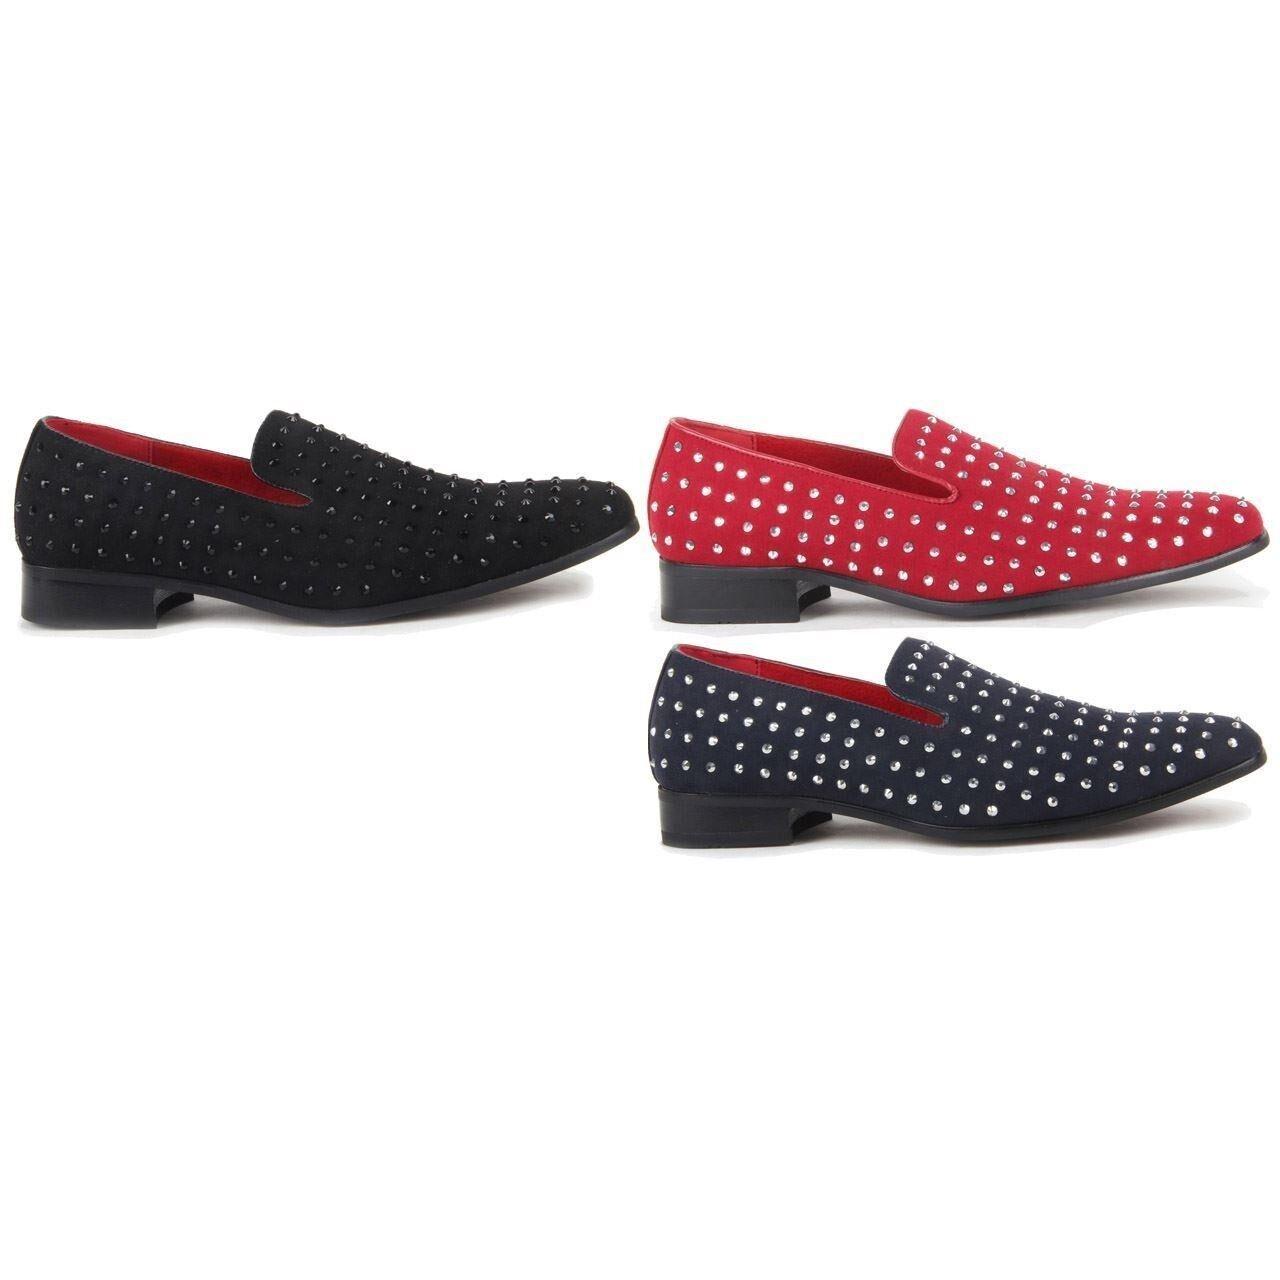 Men Italian Designer Faux Suede Slip On Studded shoes Leather Loafers (Baldoria